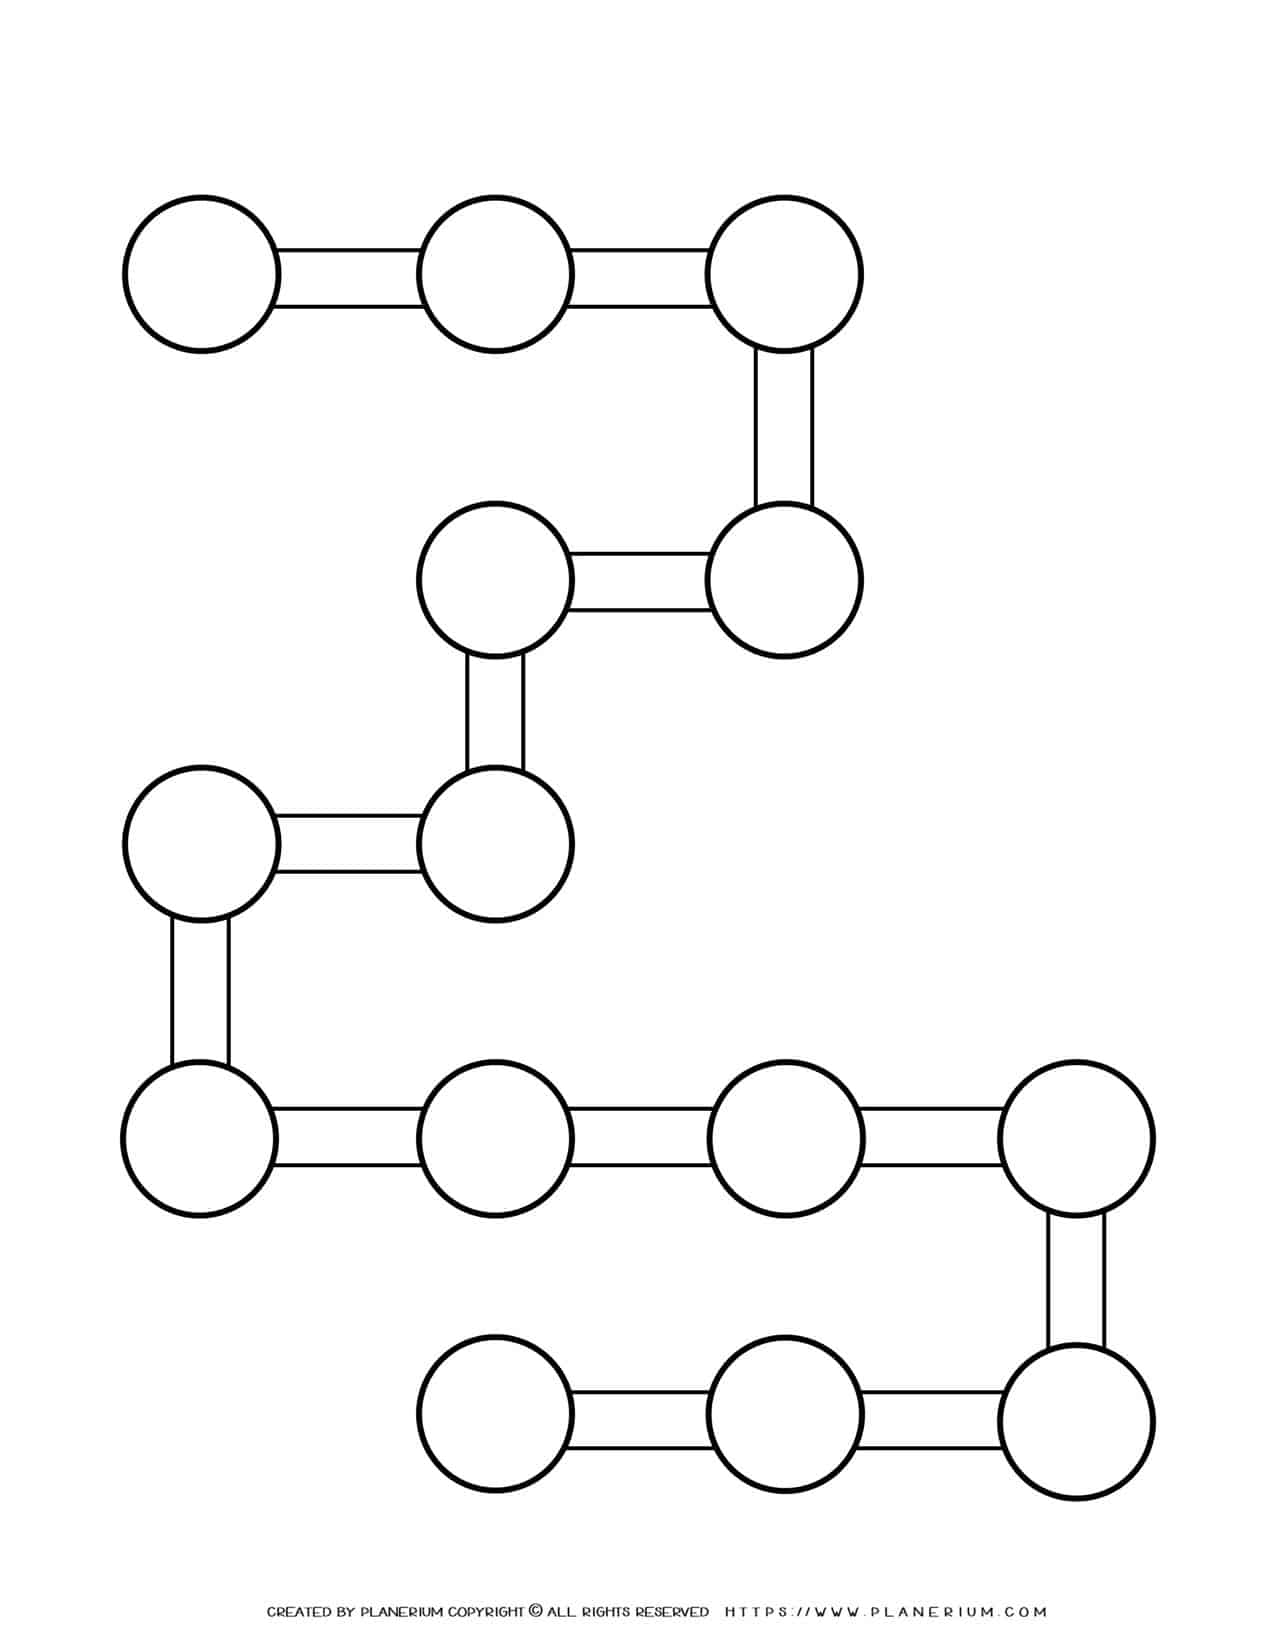 Sequence Chart Template - Fourteen Circles on a B Shape   Planerium